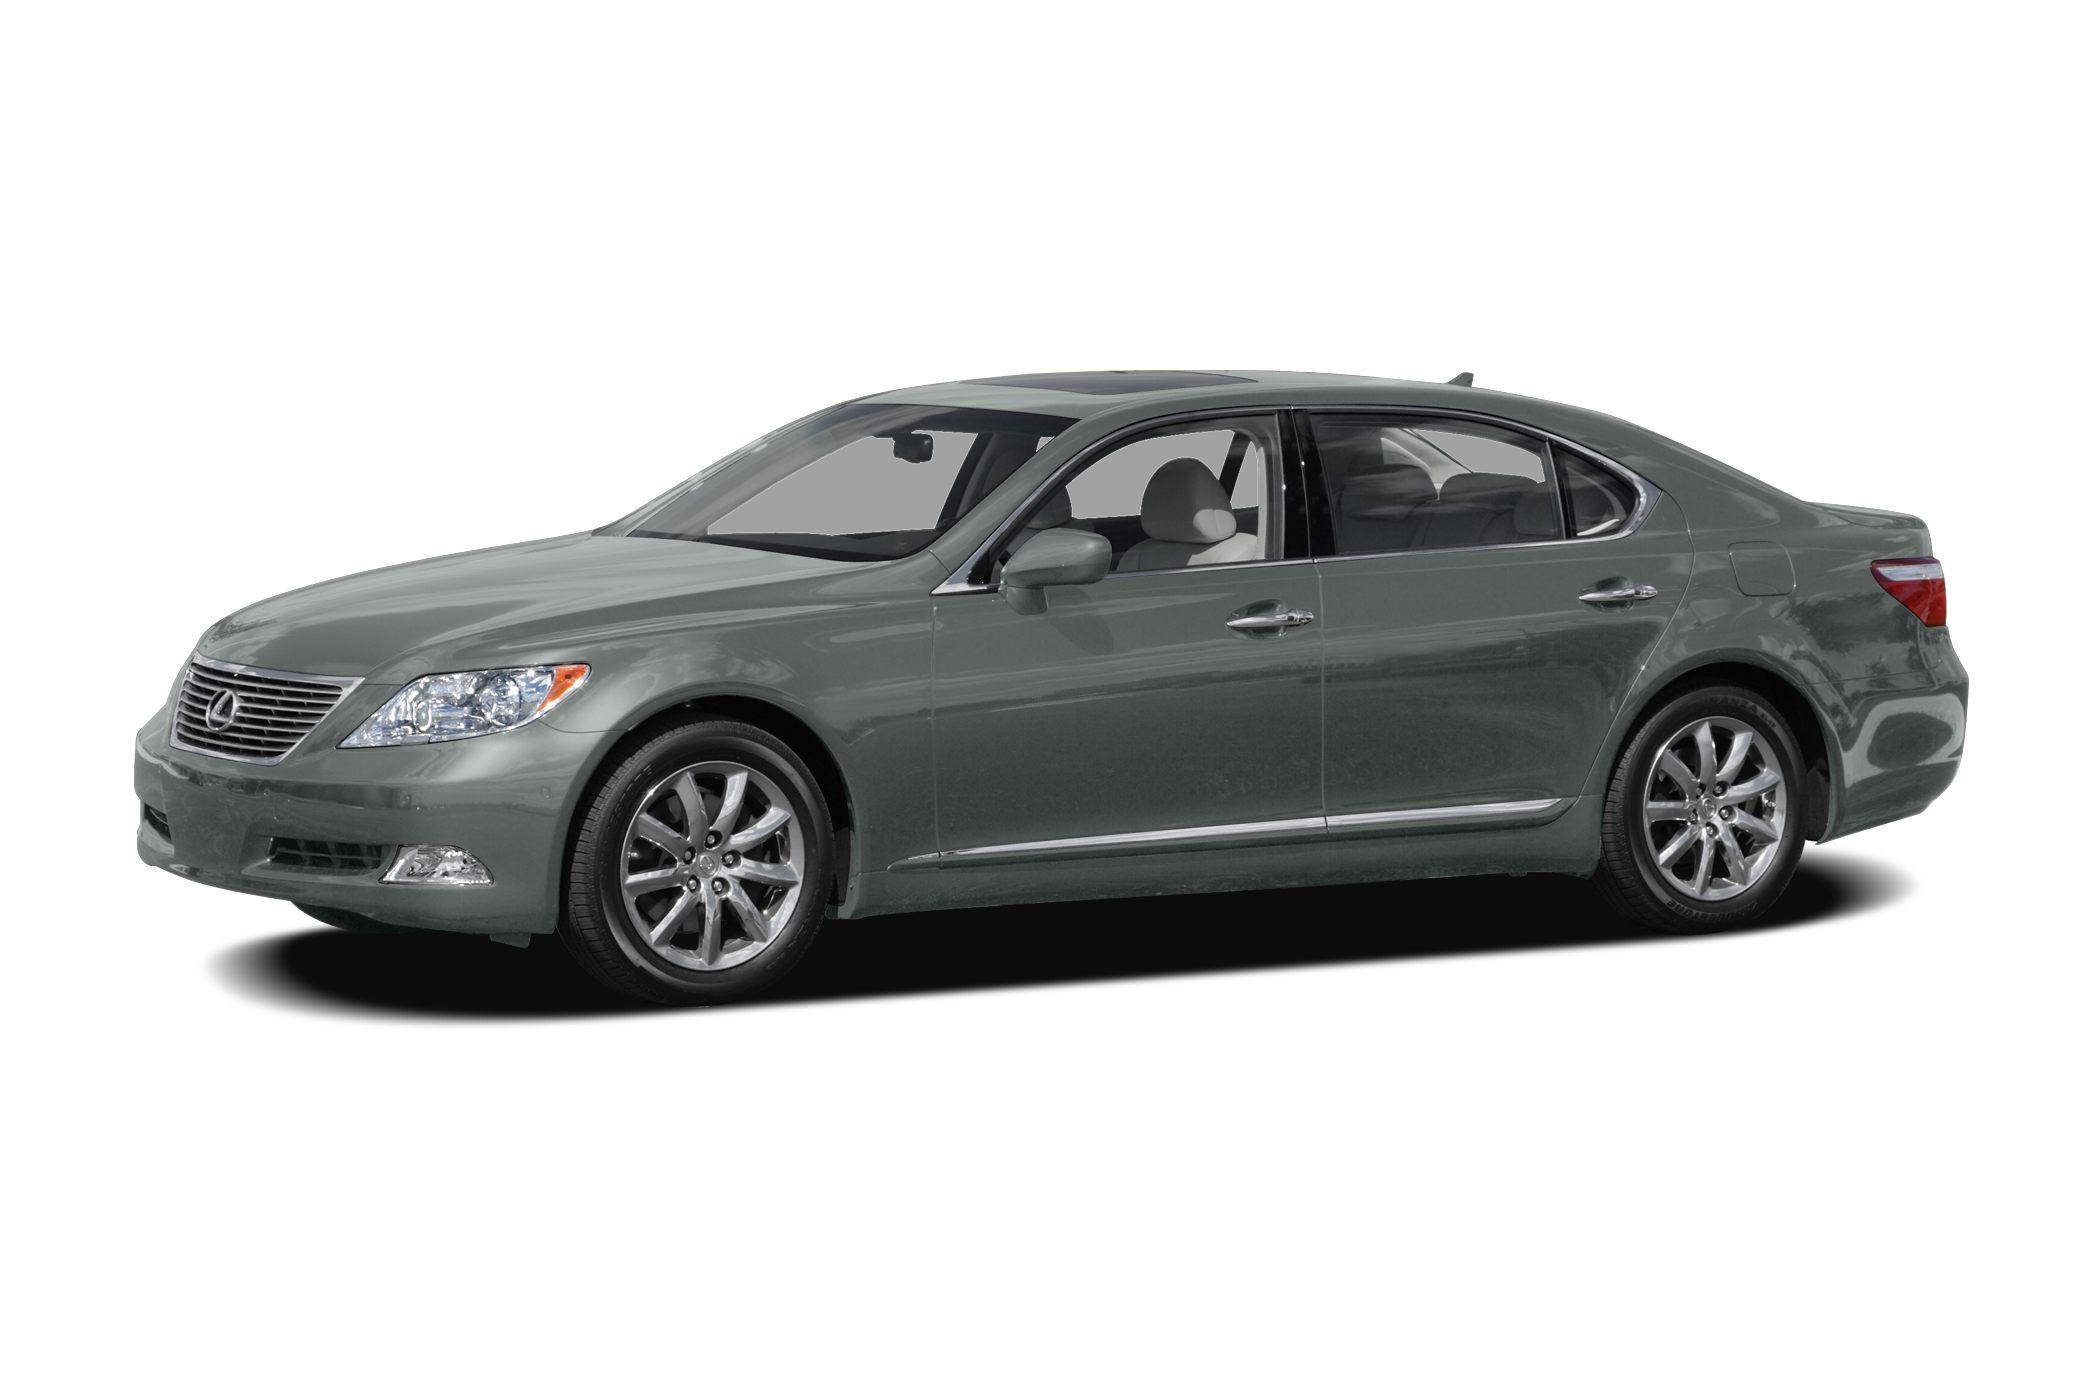 2008 Lexus Ls 460 Owner Reviews And Ratings